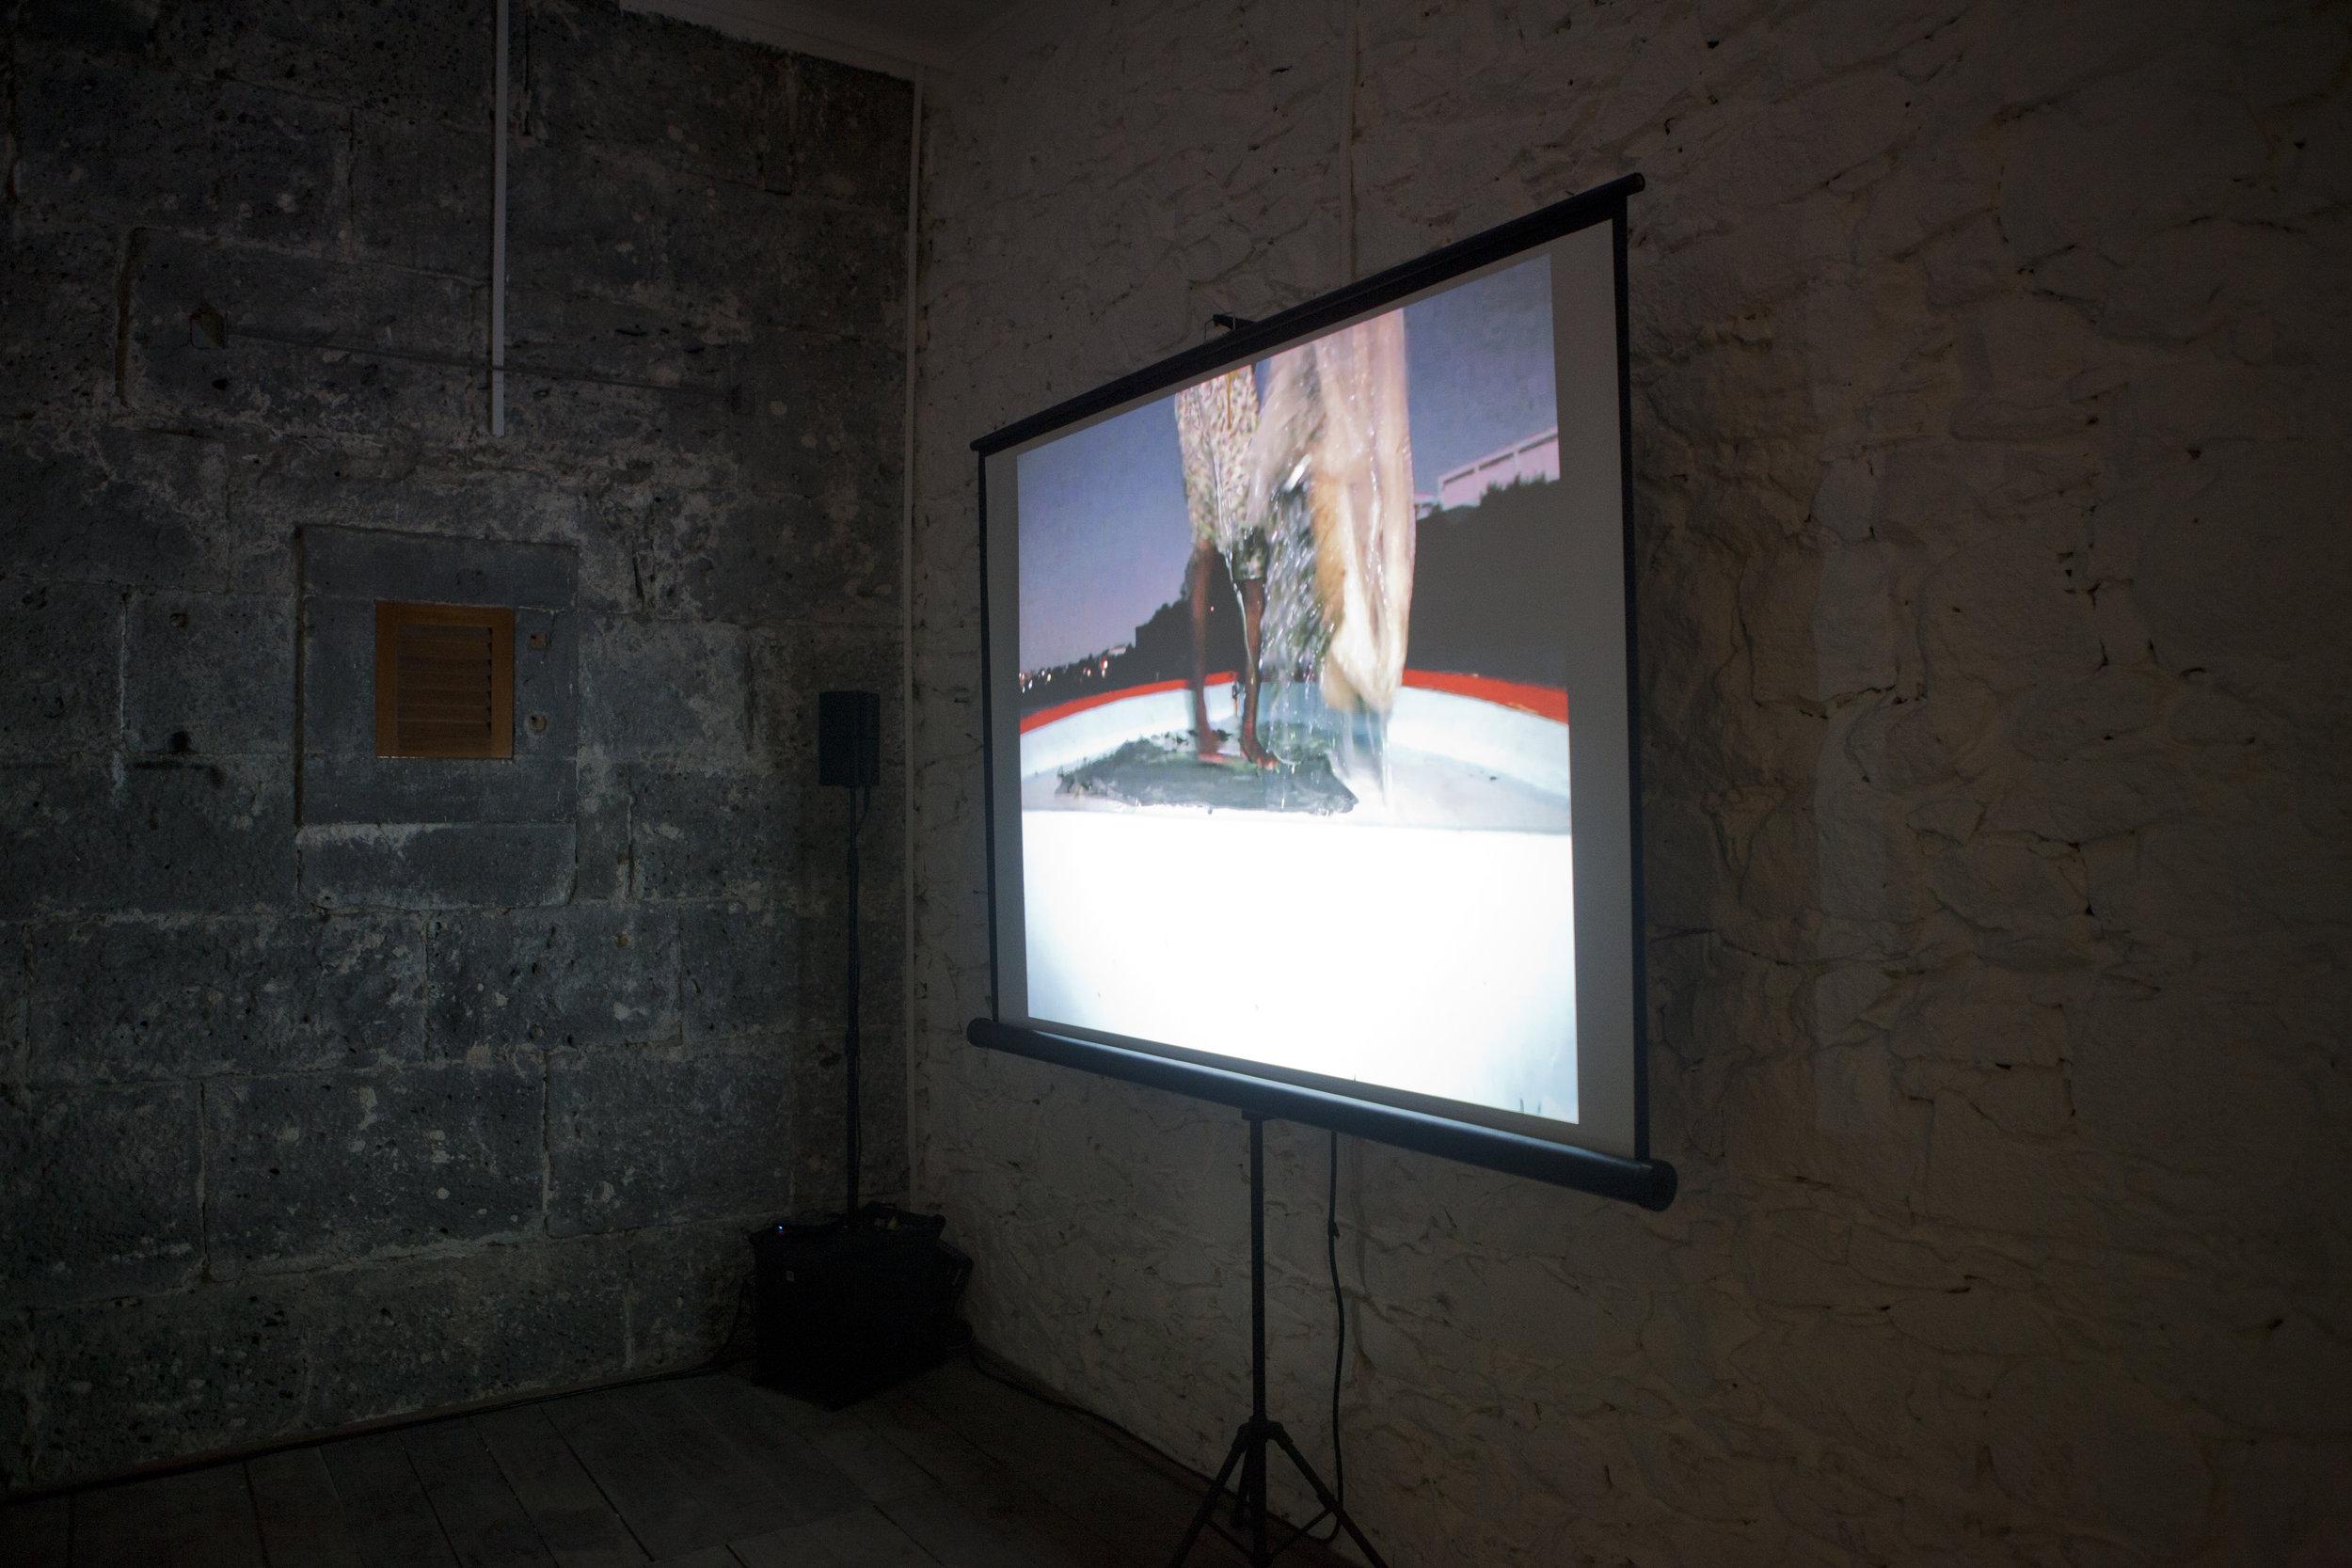 Diana Heise,Installation view,  Edge Effects, La Citadelle, Mauritius, 2016